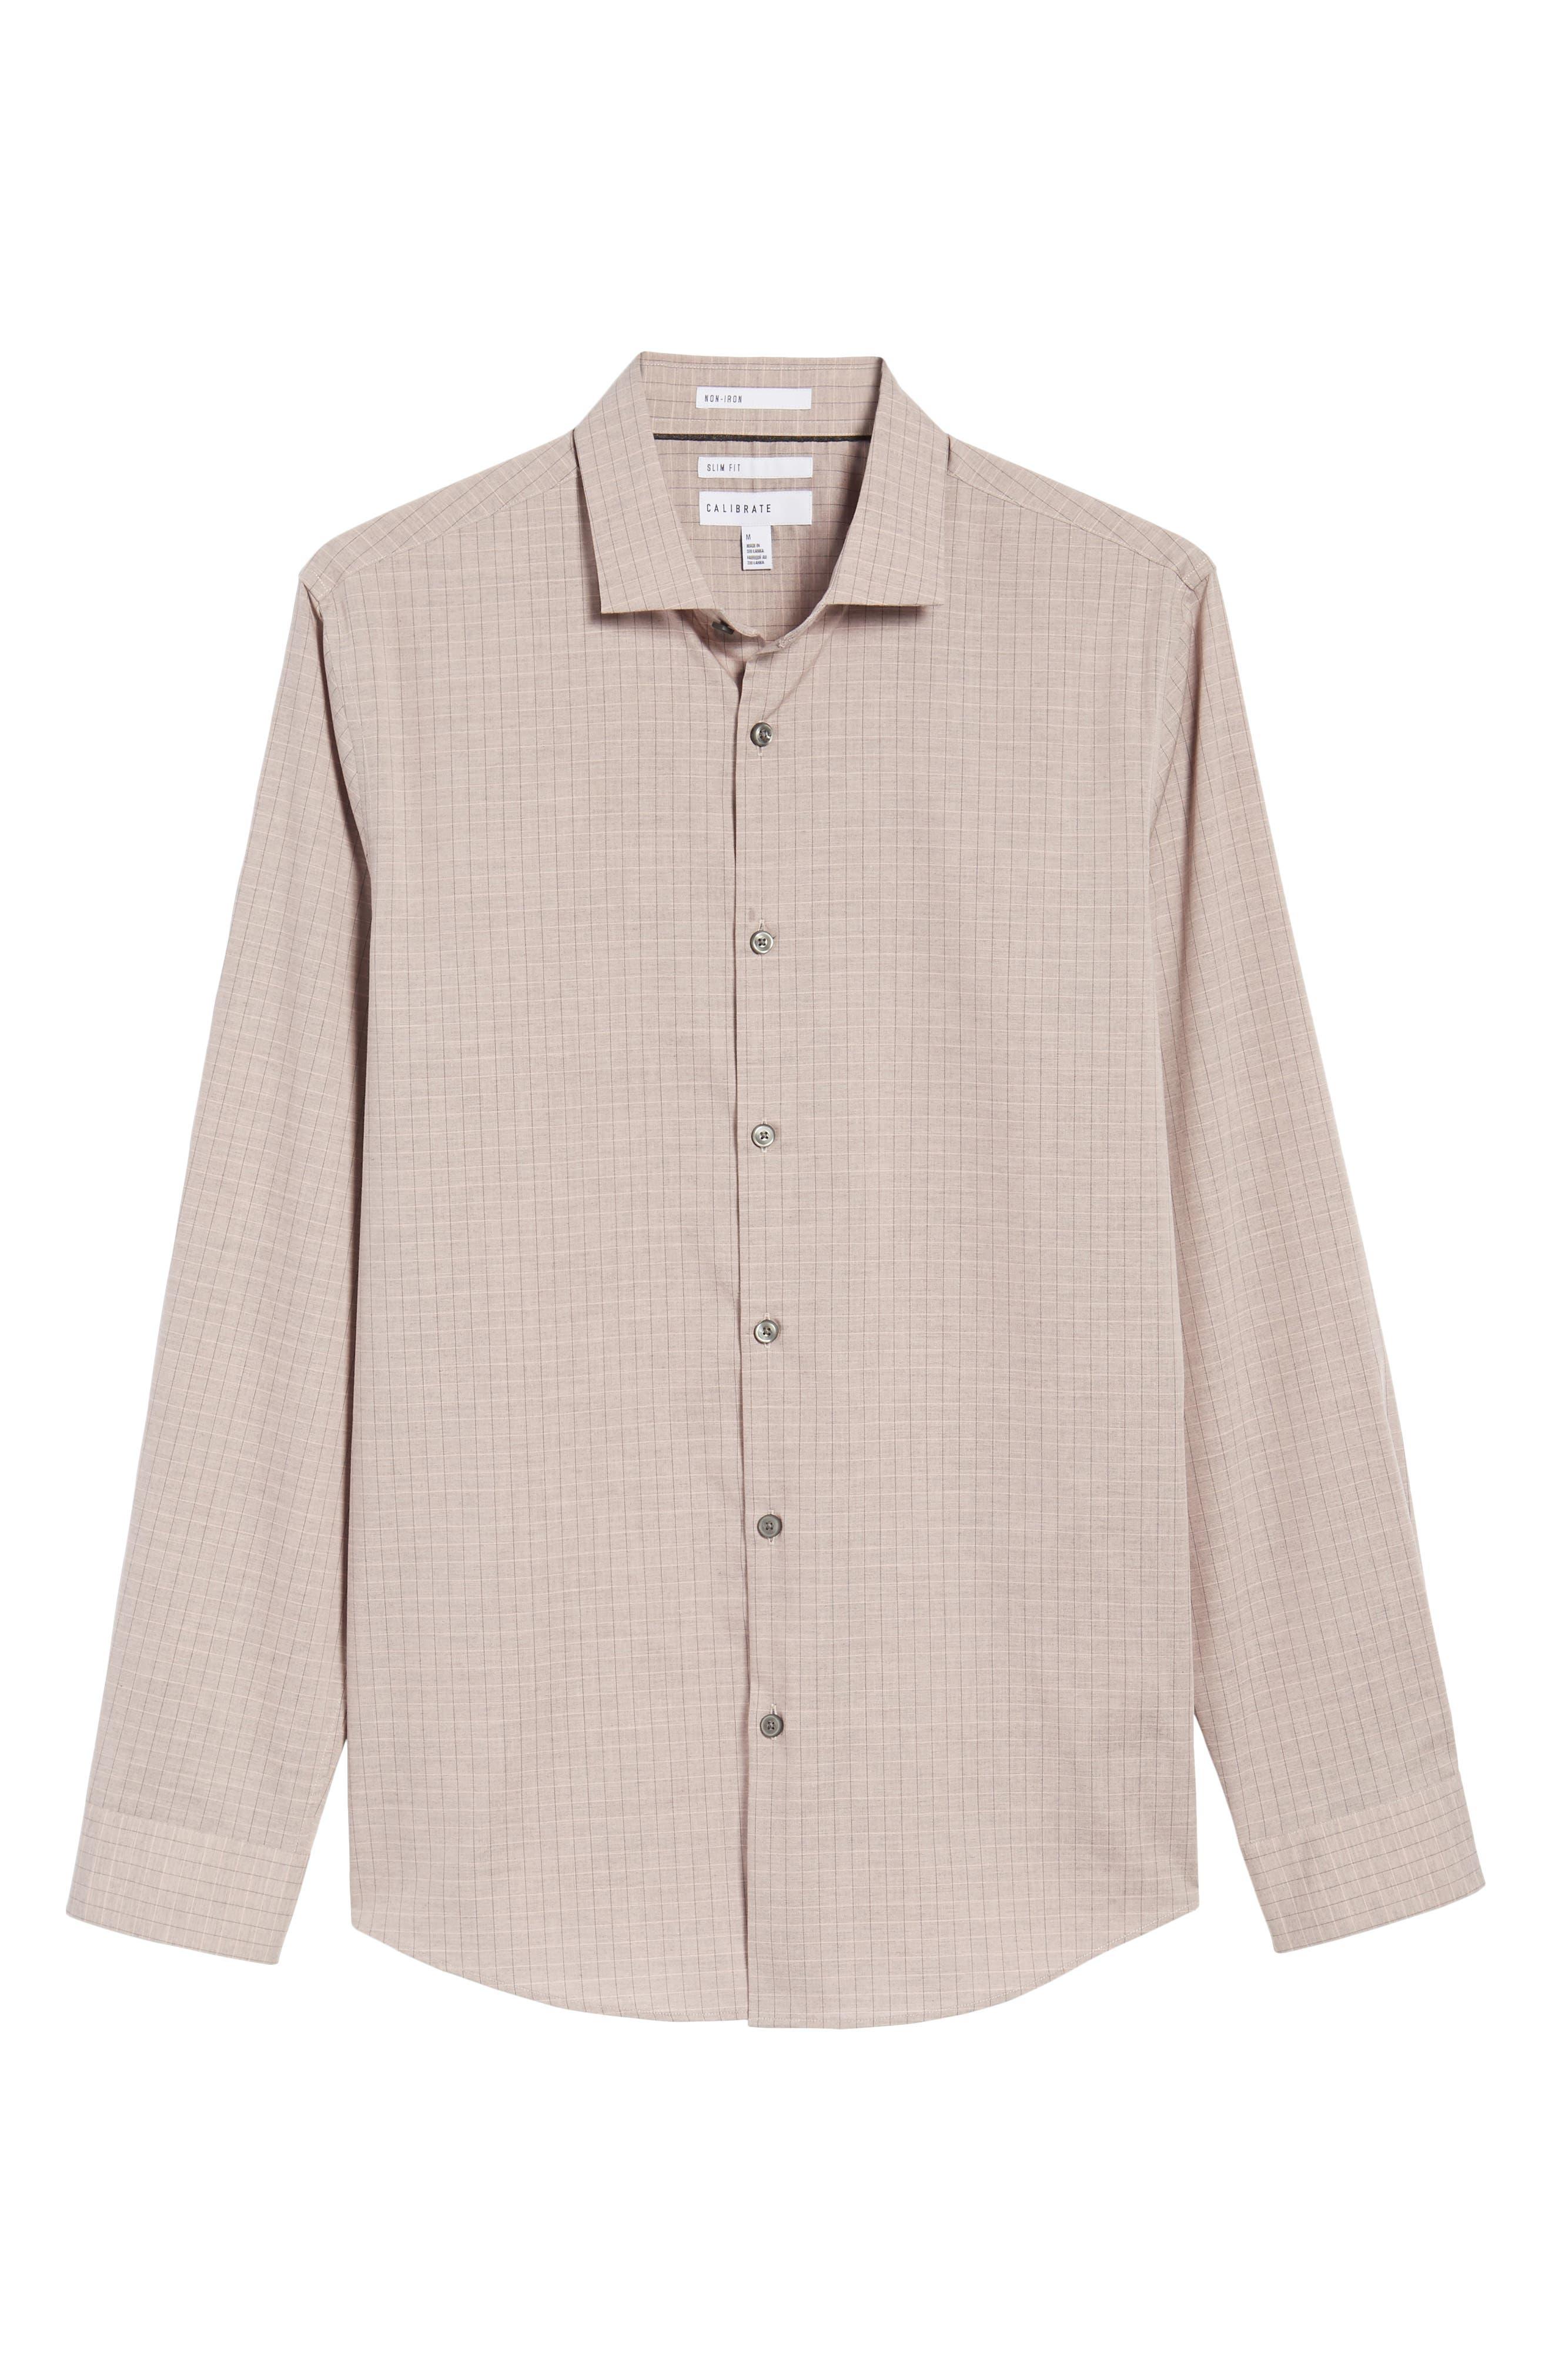 Grid Sport Shirt,                             Alternate thumbnail 6, color,                             Pink Silver Heather Grid